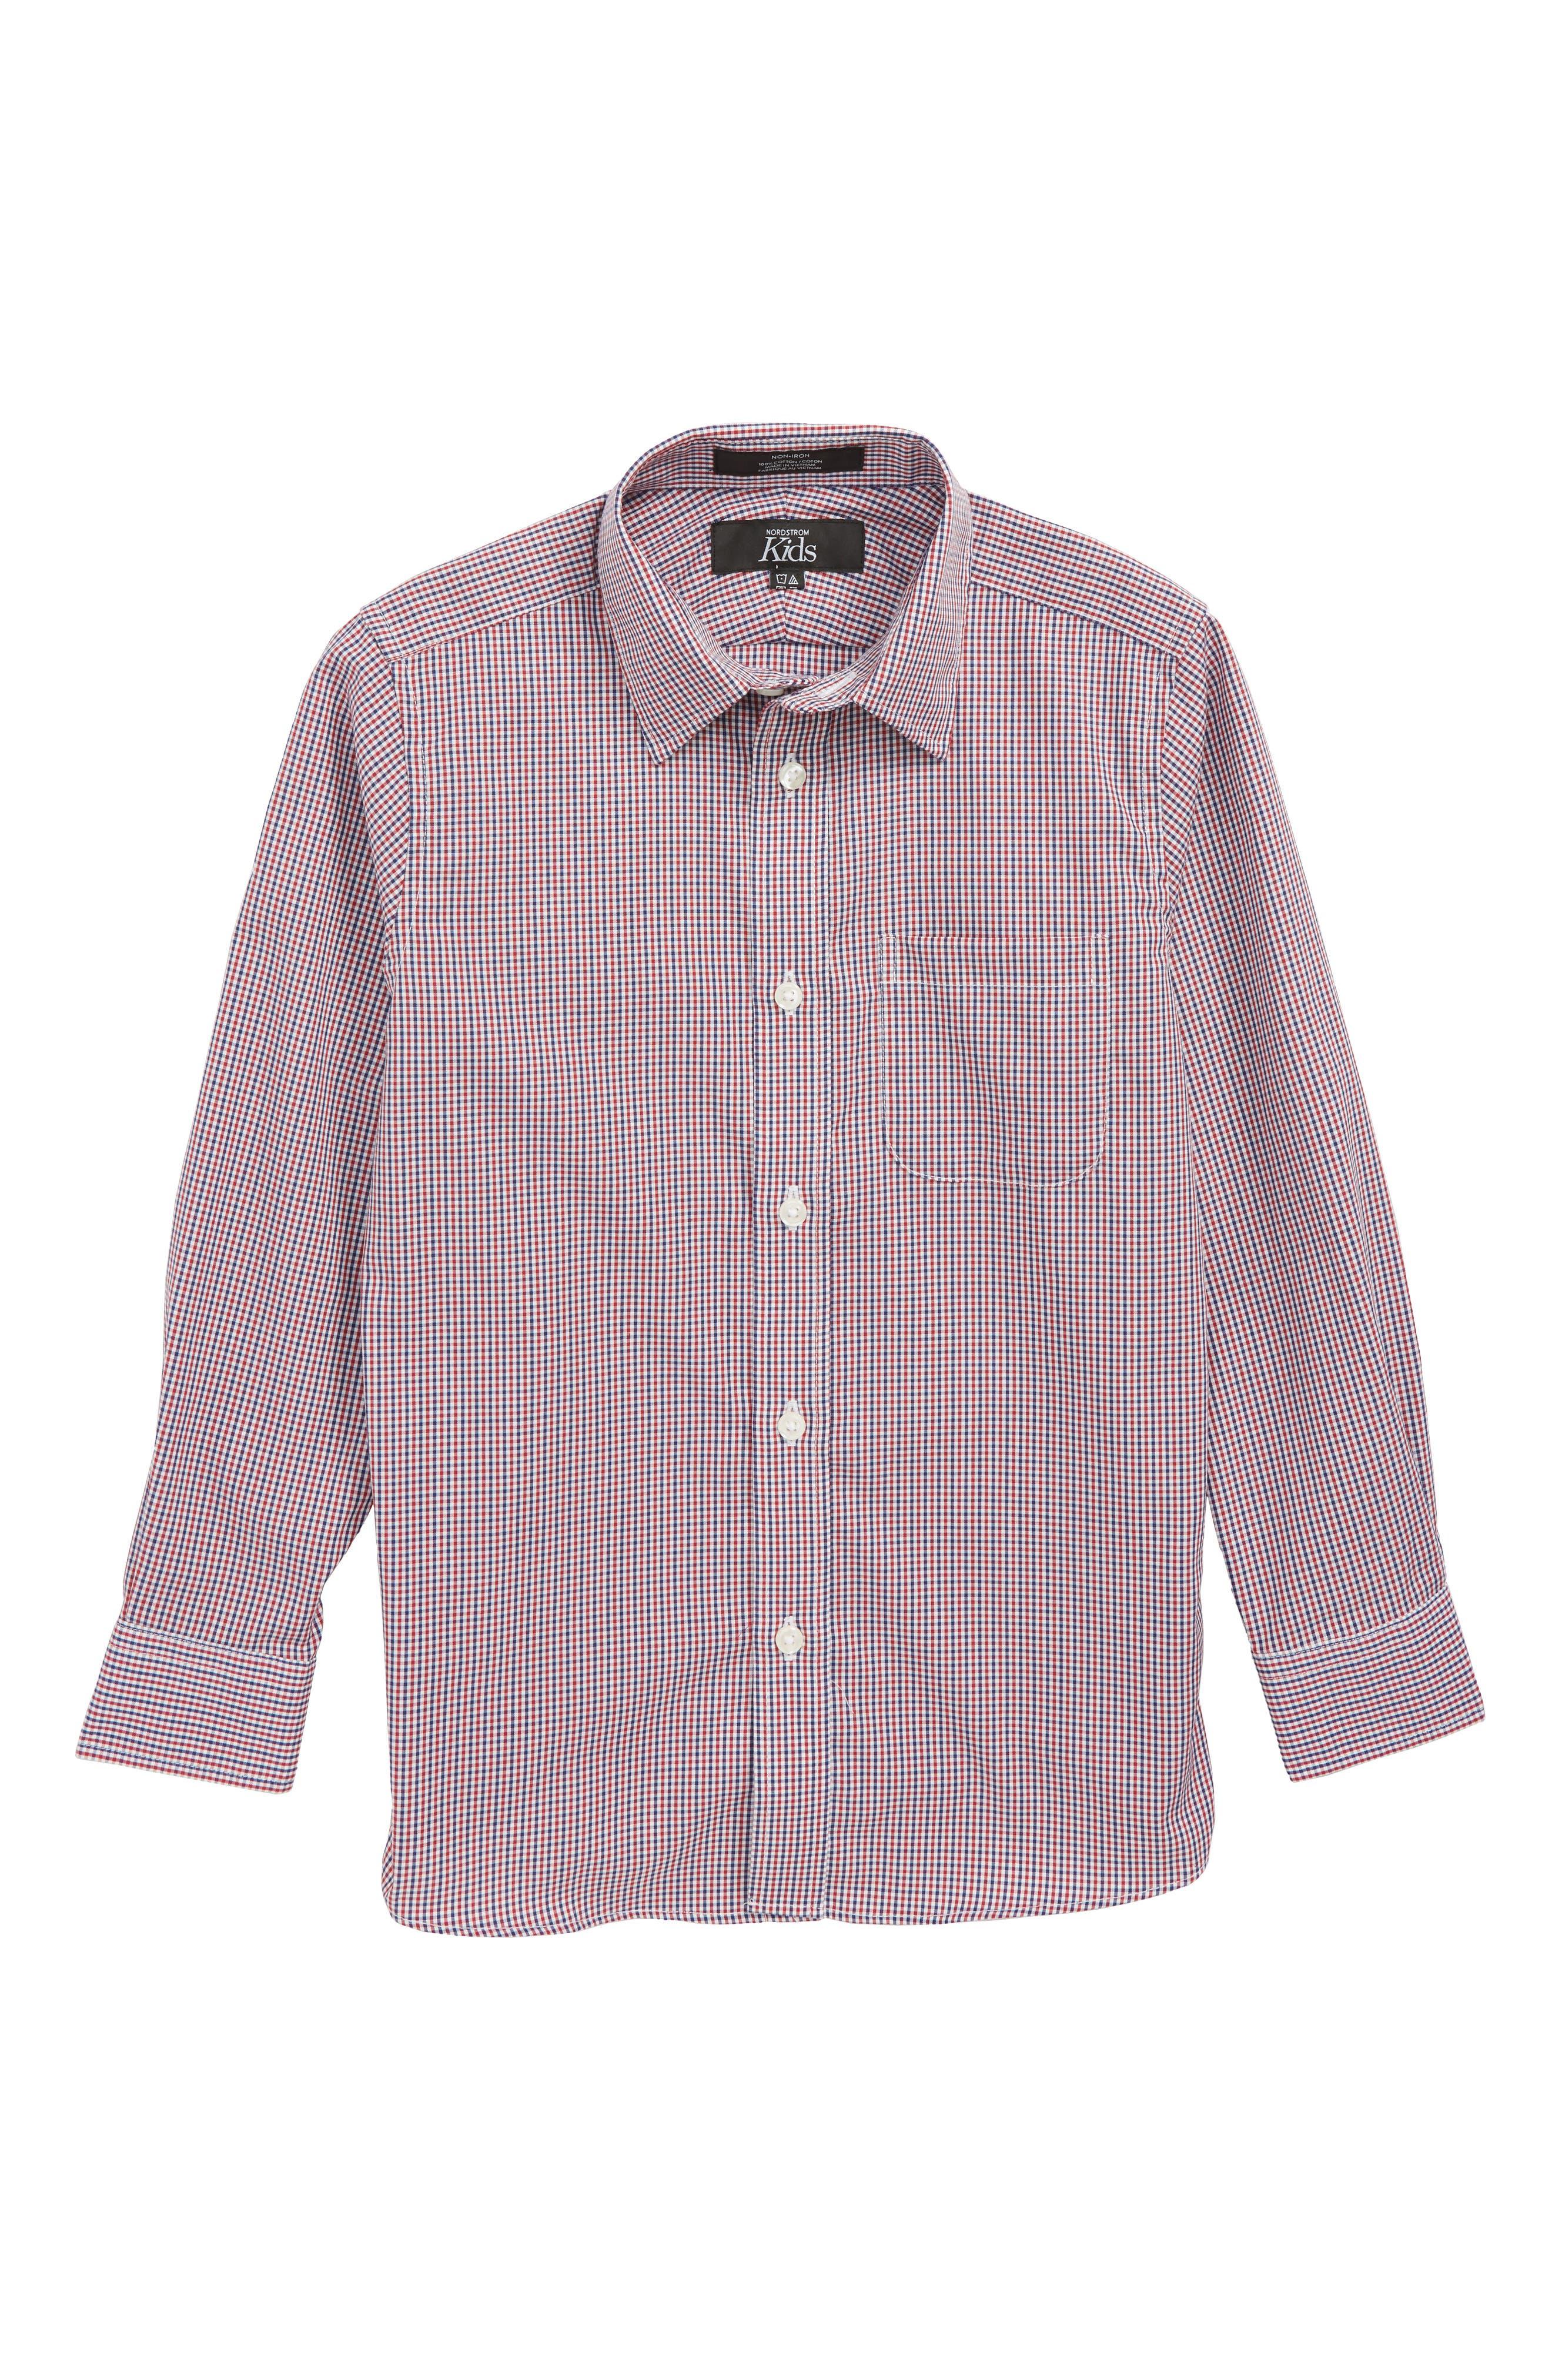 Non-Iron Check Dress Shirt,                         Main,                         color, RED SAGE- NAVY PLAID